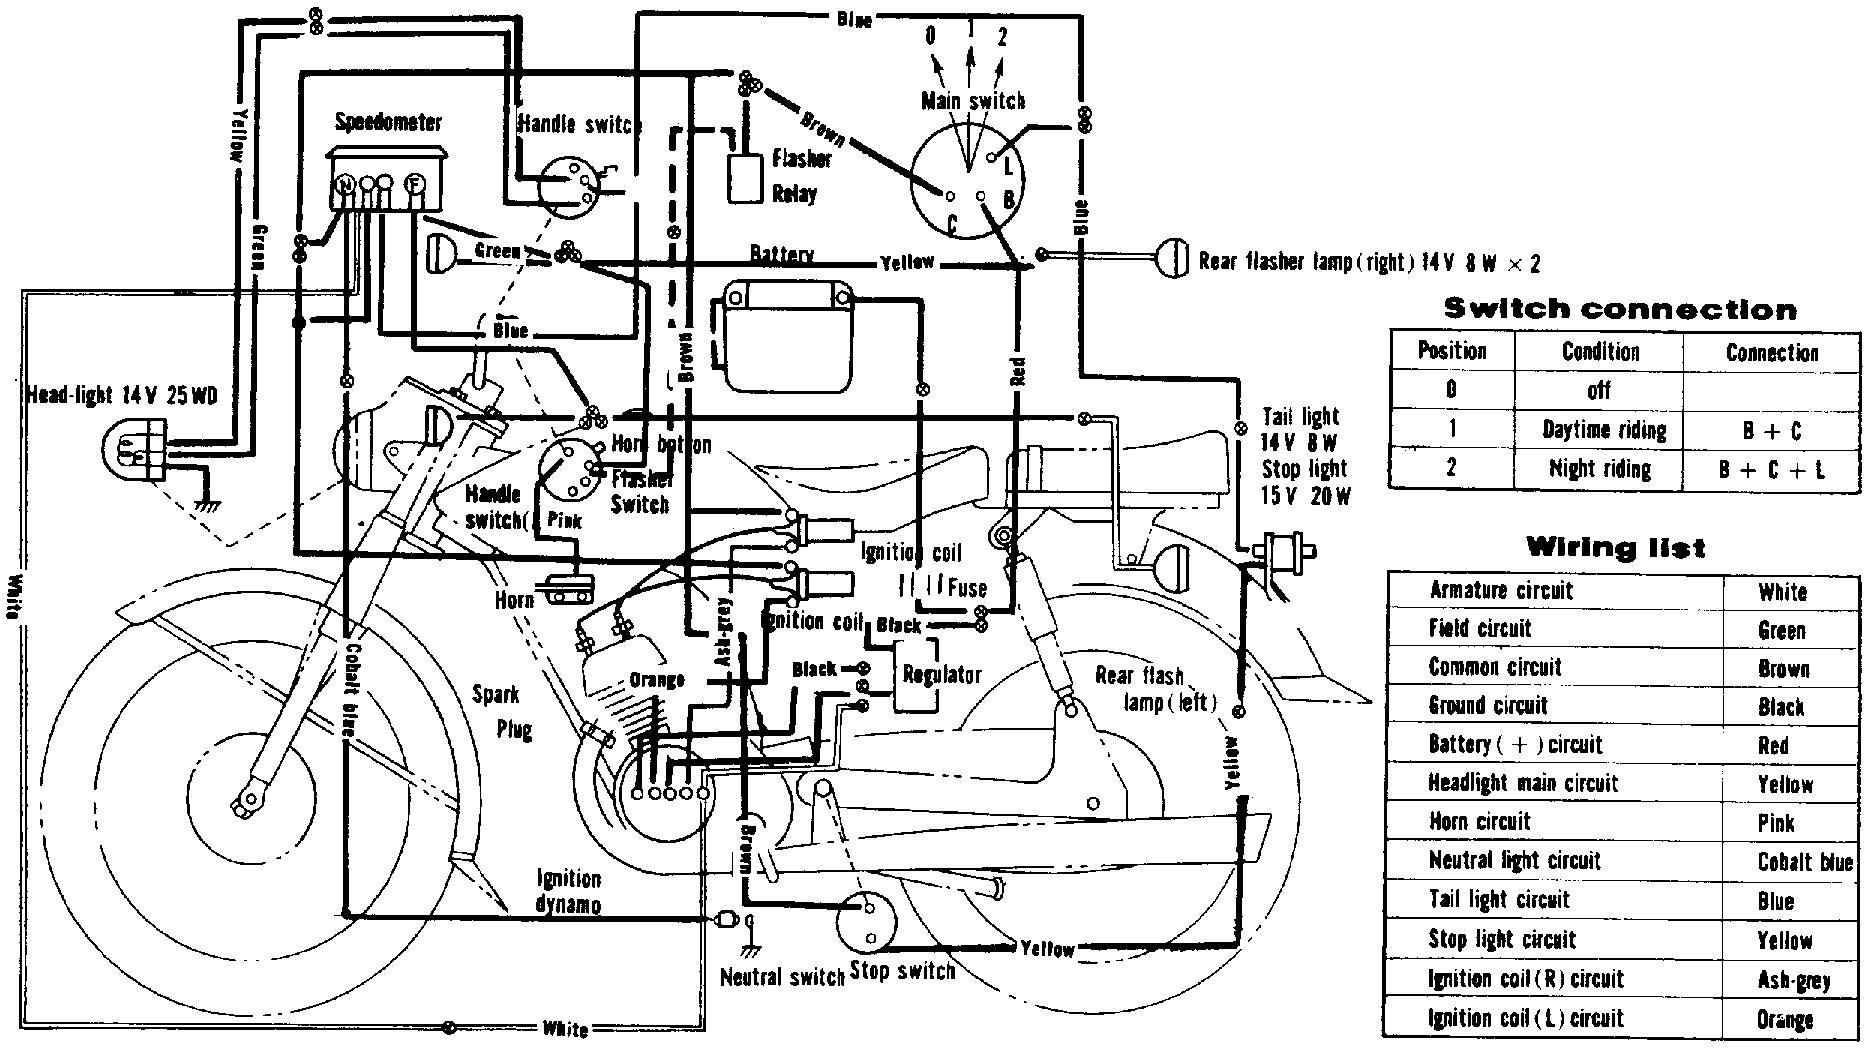 hight resolution of yamaha l2 wiring diagram wiring diagram portal yamaha rectifier regulator wiring diagram yamaha l2 wiring diagram